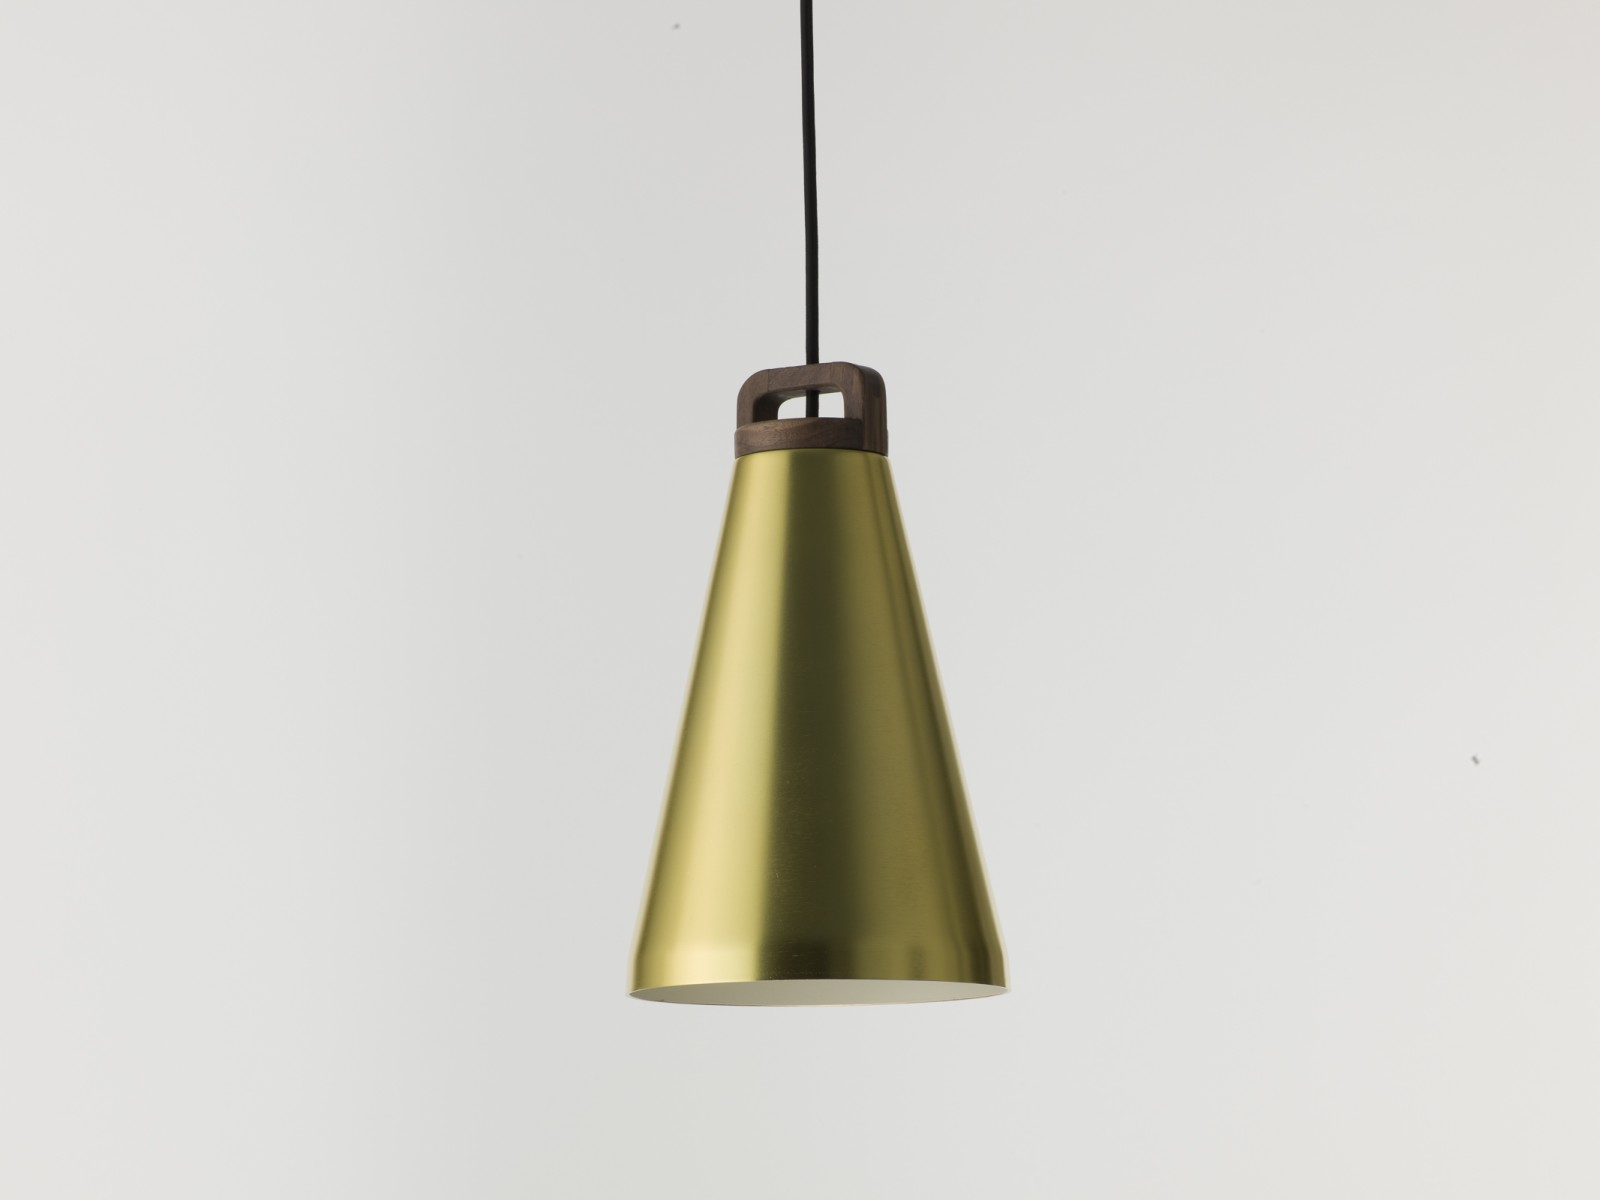 Handle Narrow Pendant Light H17 Handle Pendant lamp Brass/Walnut Narrow